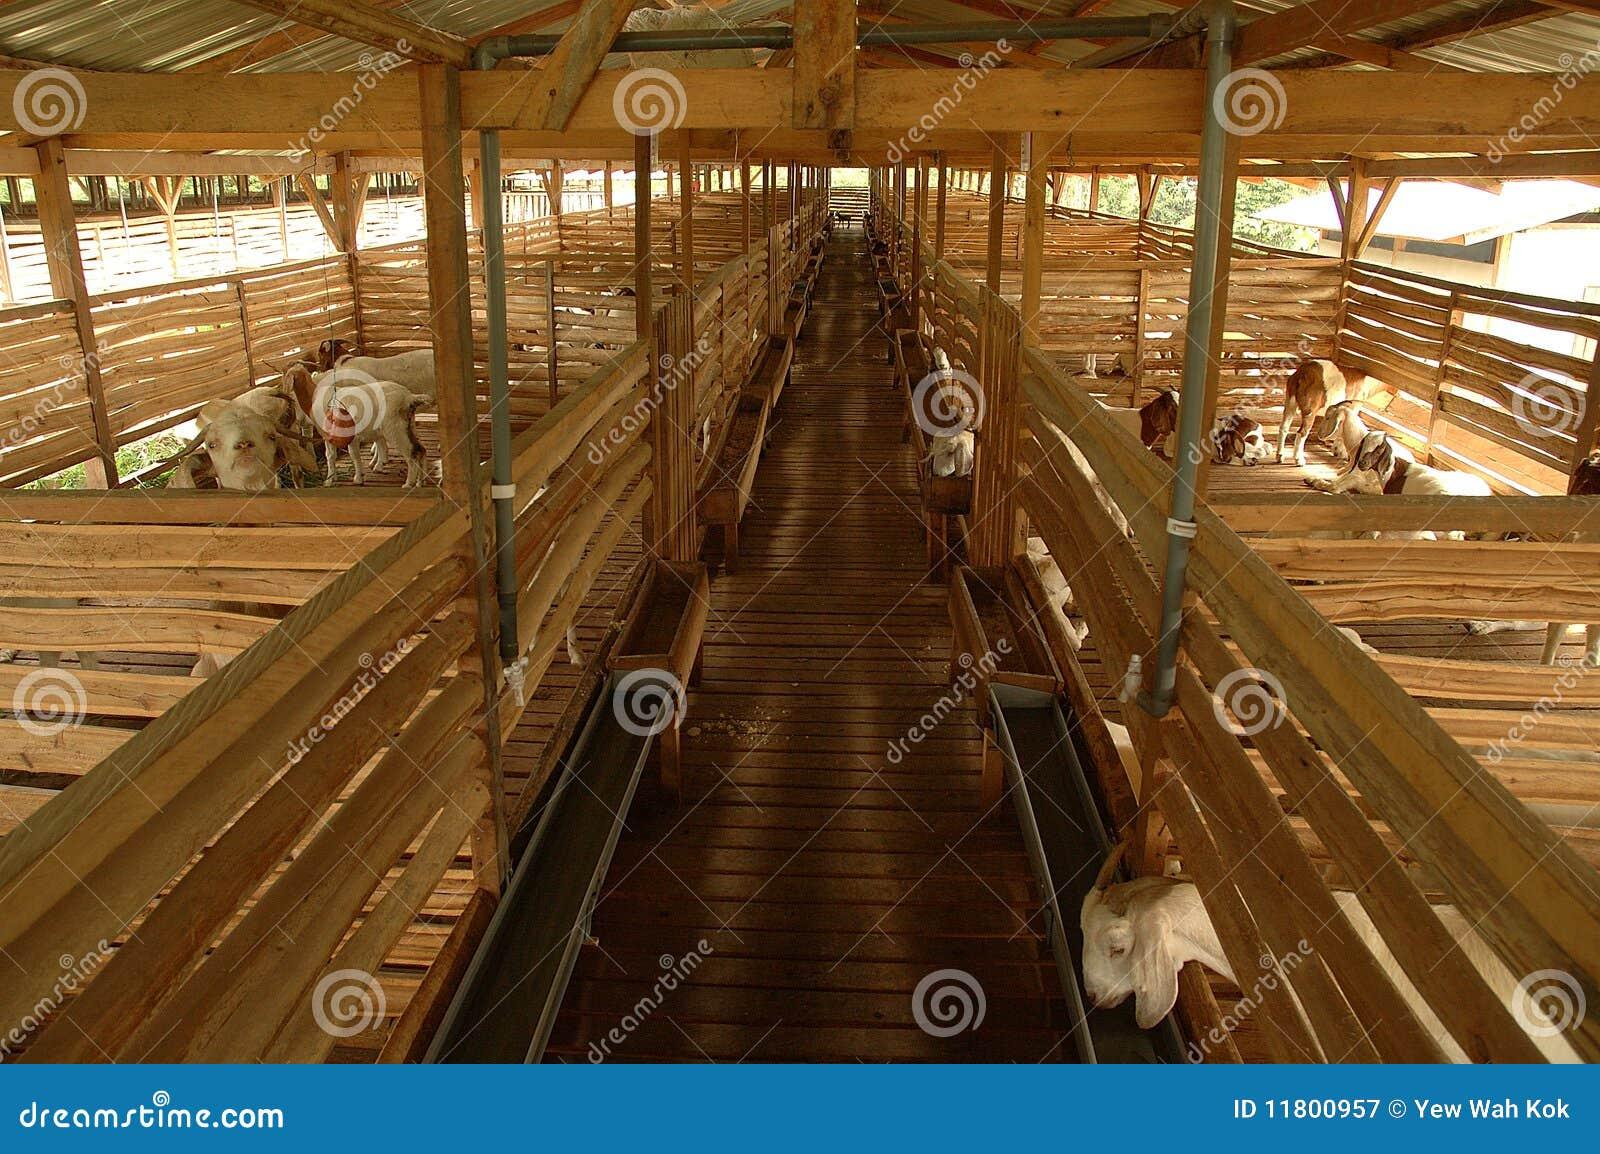 Goat farming business plan in malaysia